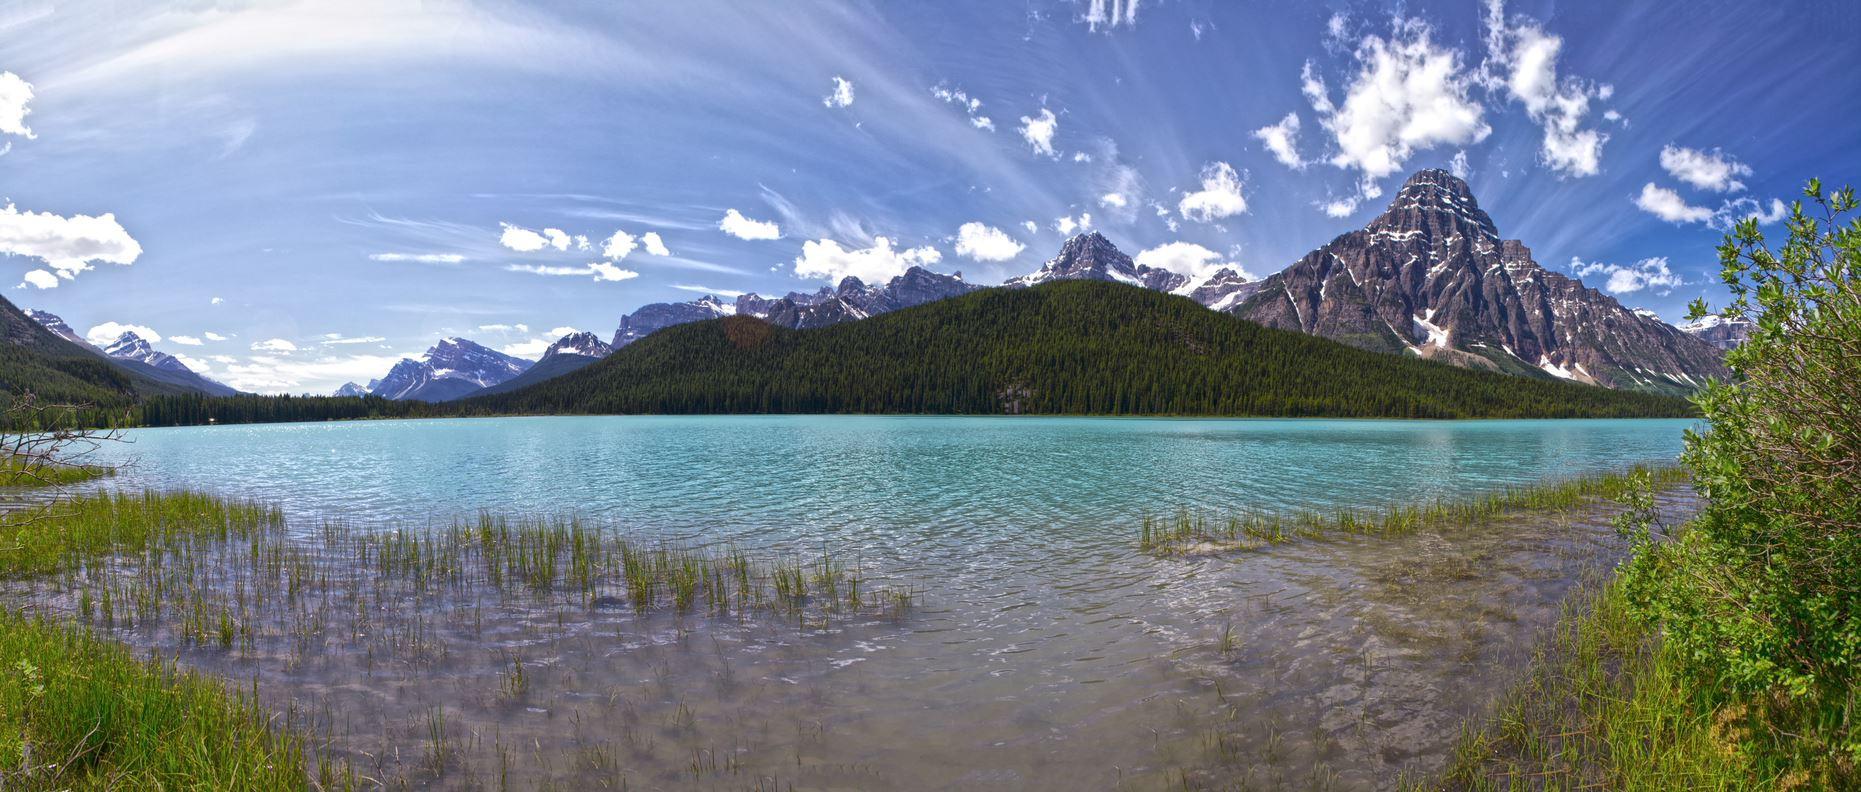 Maple-Ridge-Pitt-Meadows-Mountain-Range-Scenic